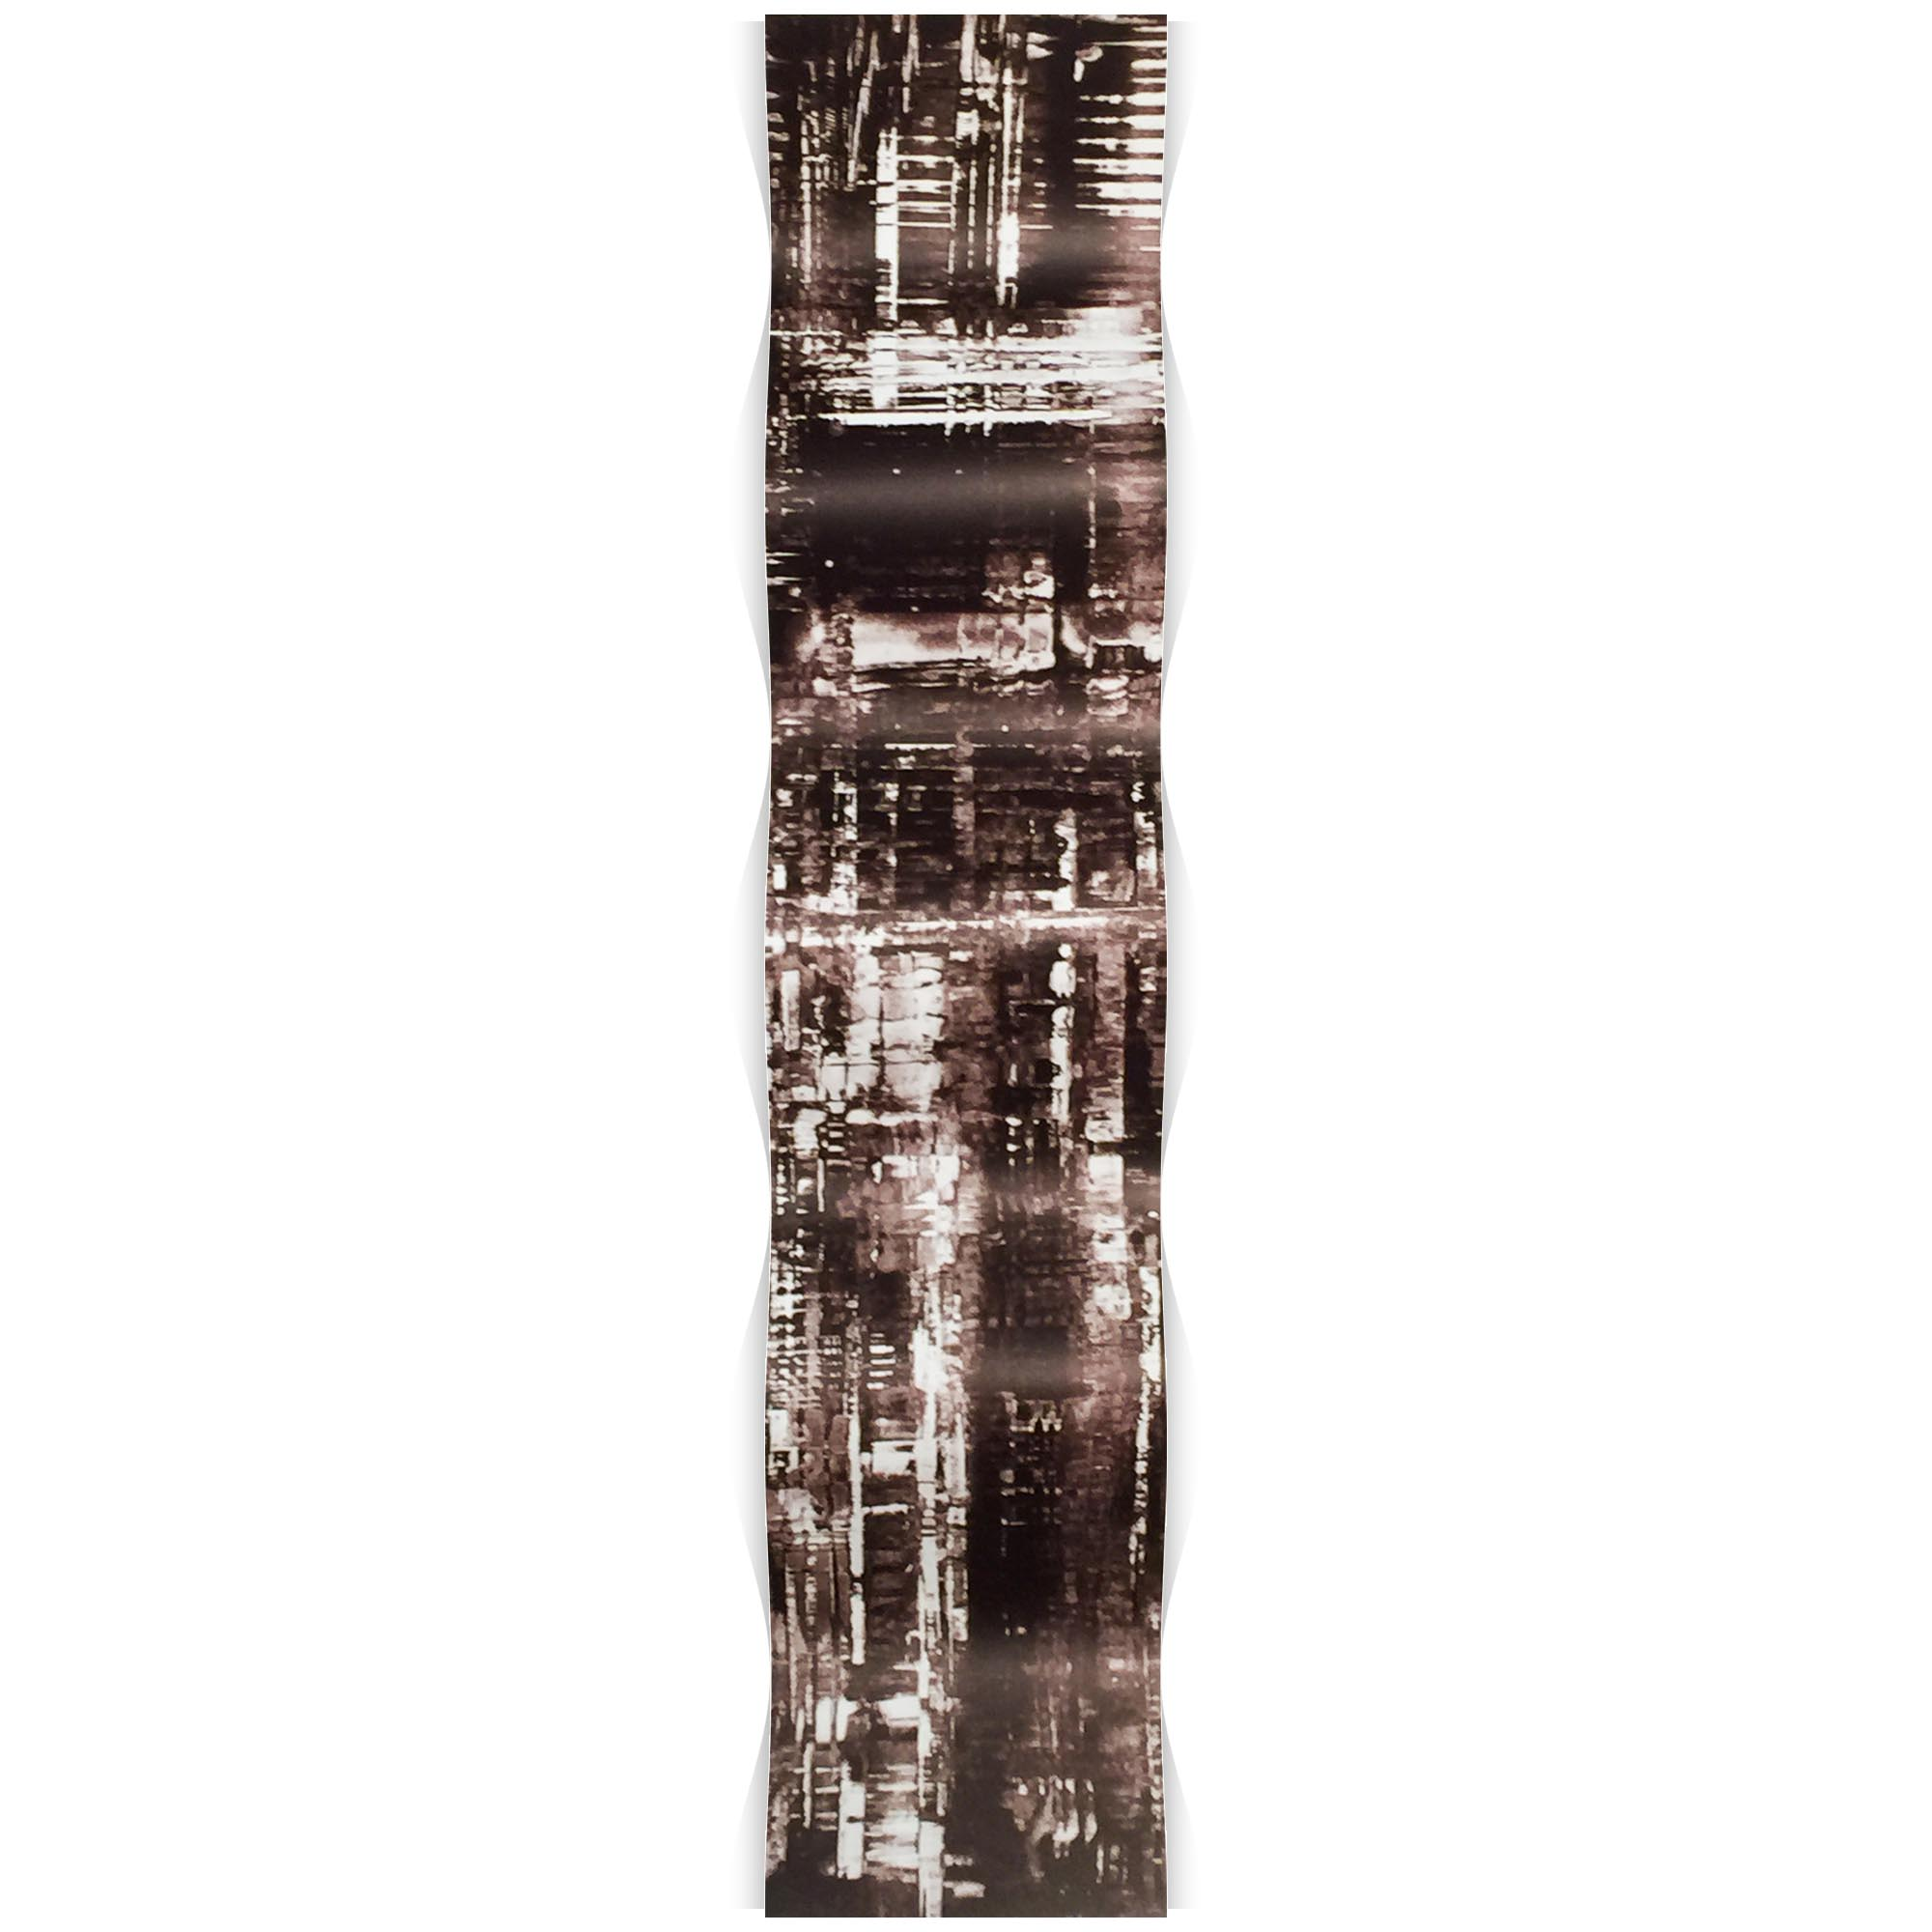 Aporia Black Wave 9.5x44in. Metal Eclectic Decor - Image 2